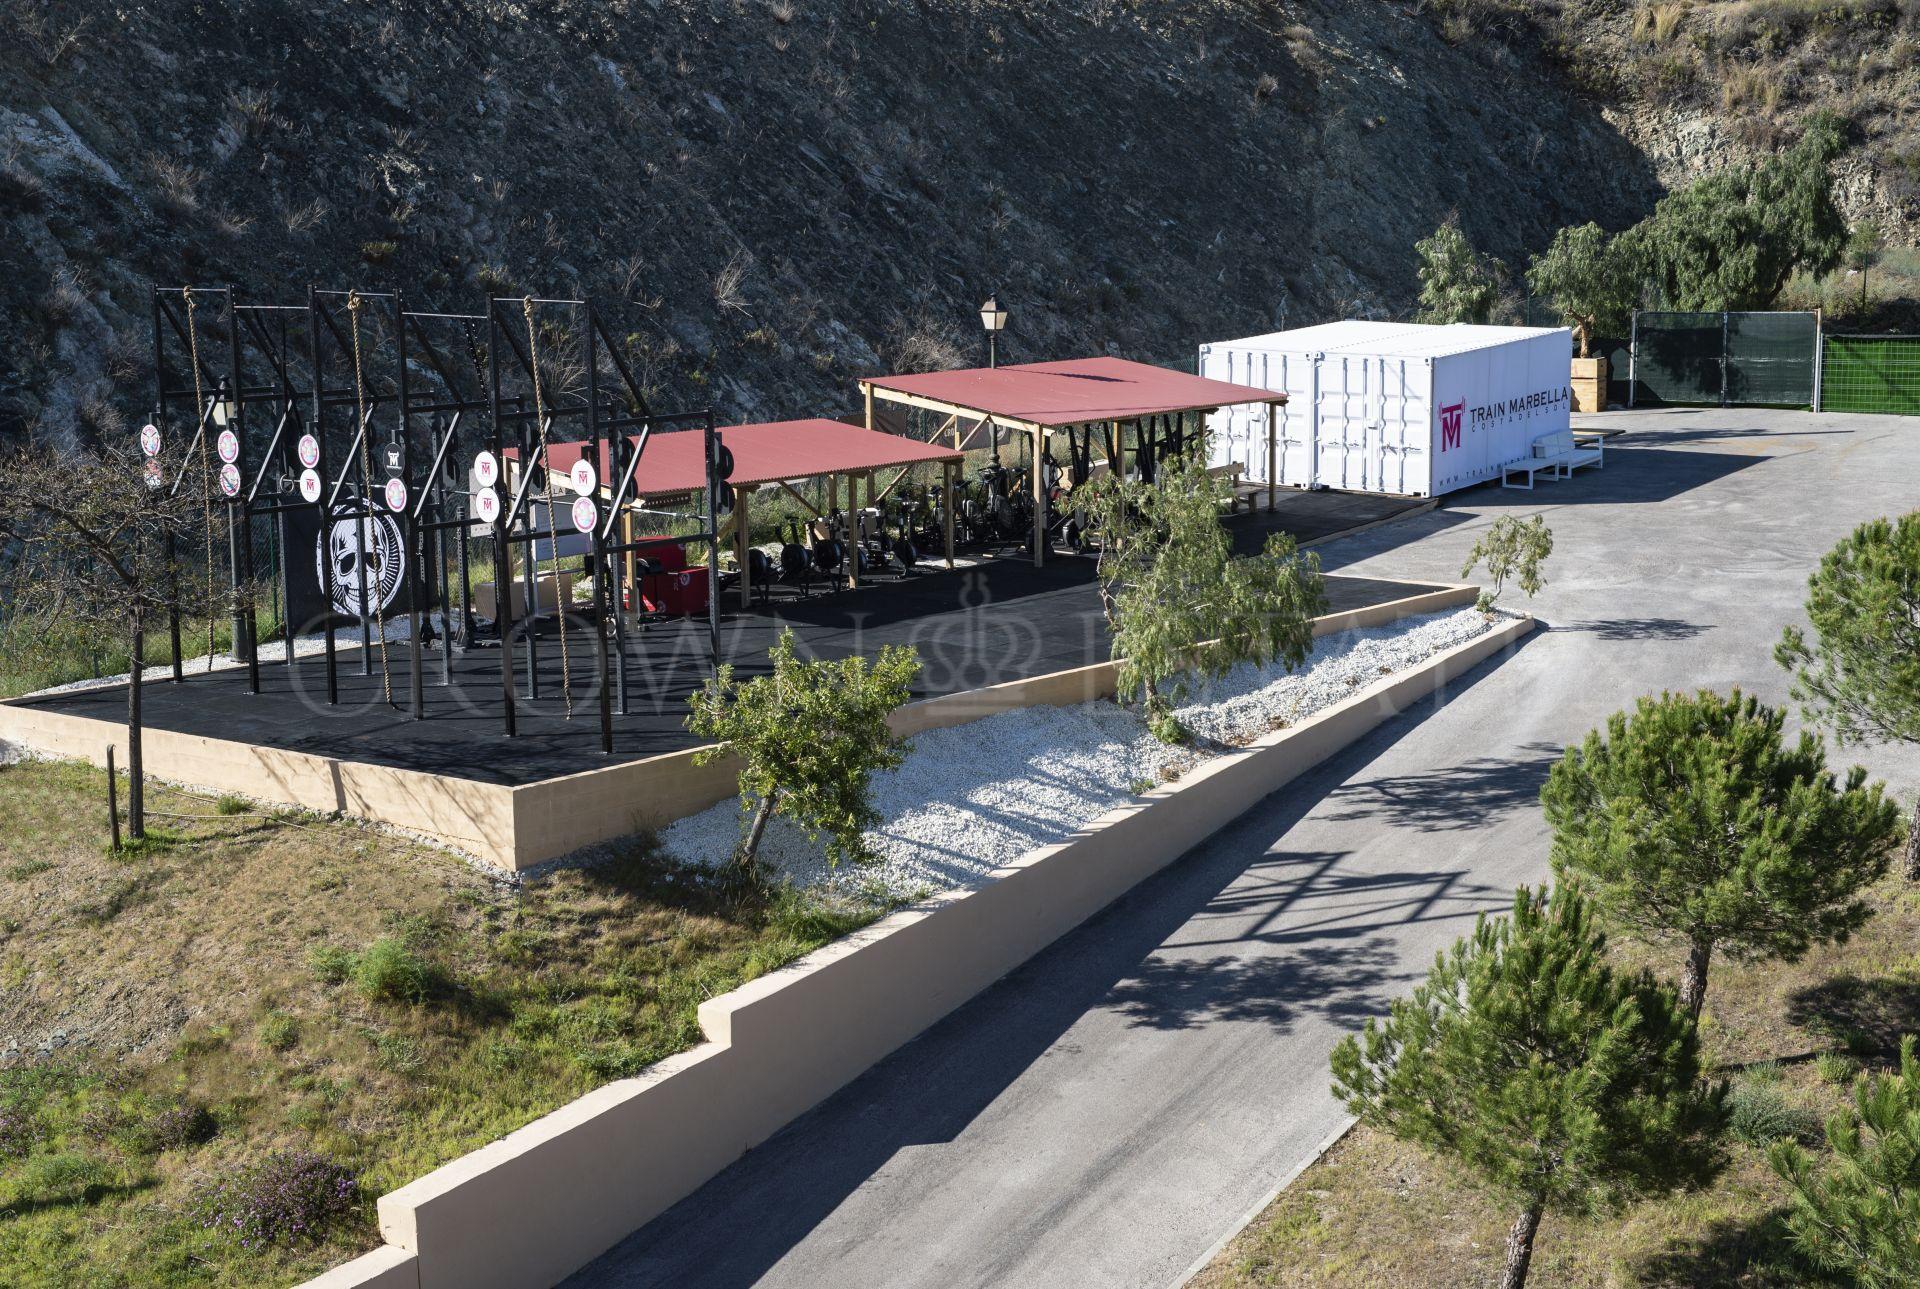 Development in La Alqueria, Benahavis